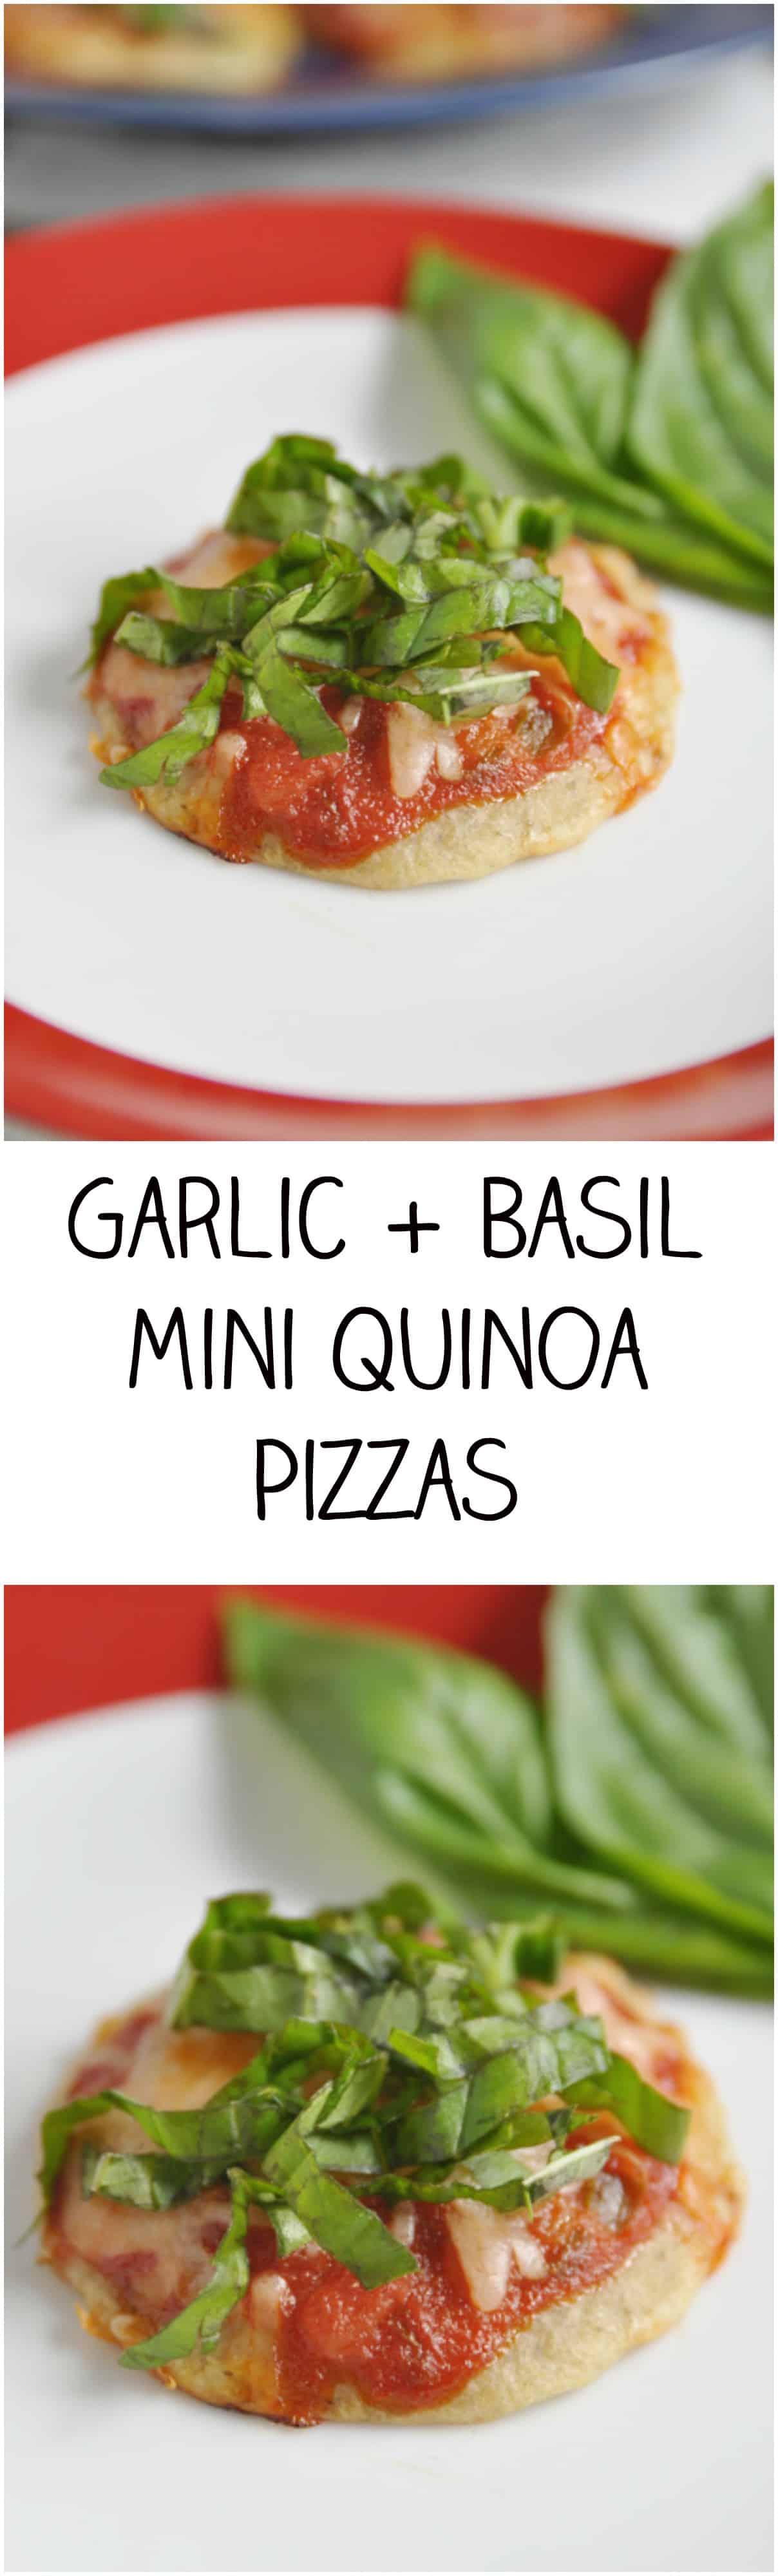 Garlic + Basil Mini Quinoa Pizzas